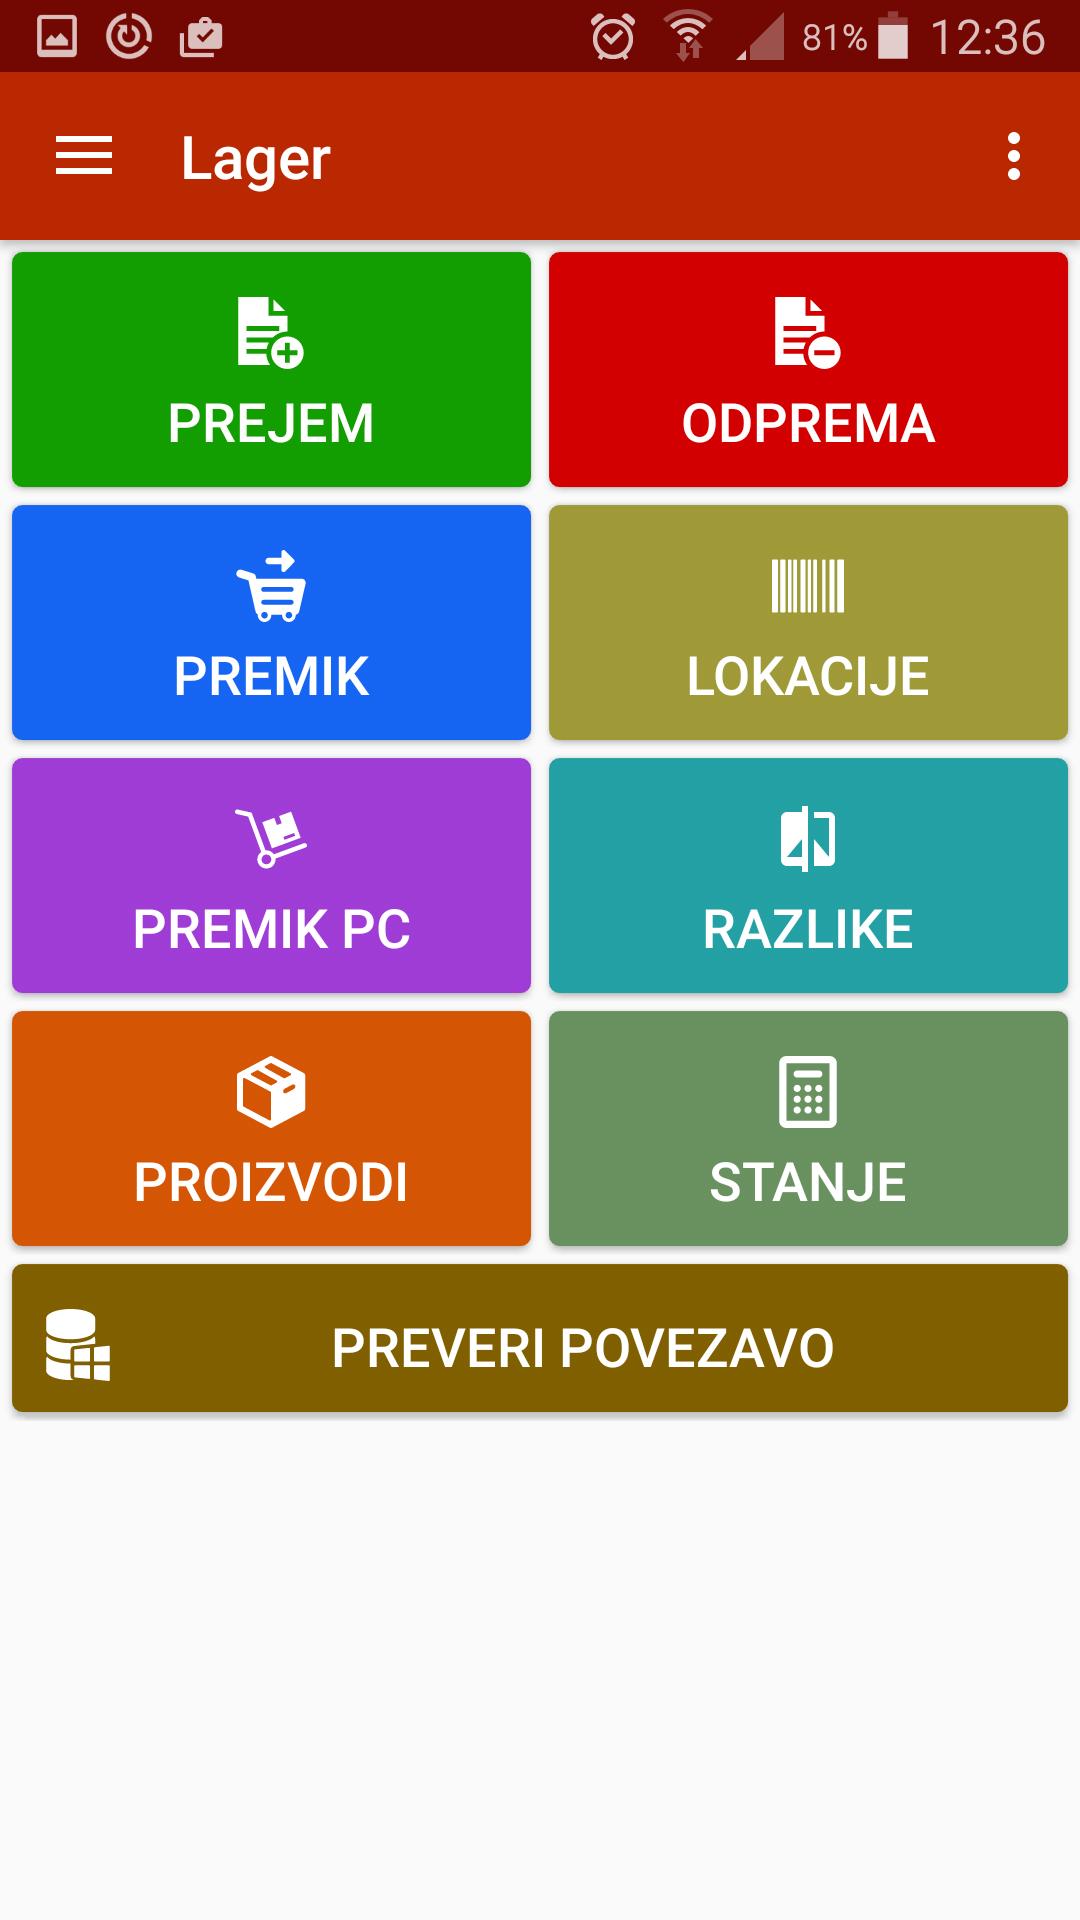 Osnovno okno aplikacije Lager